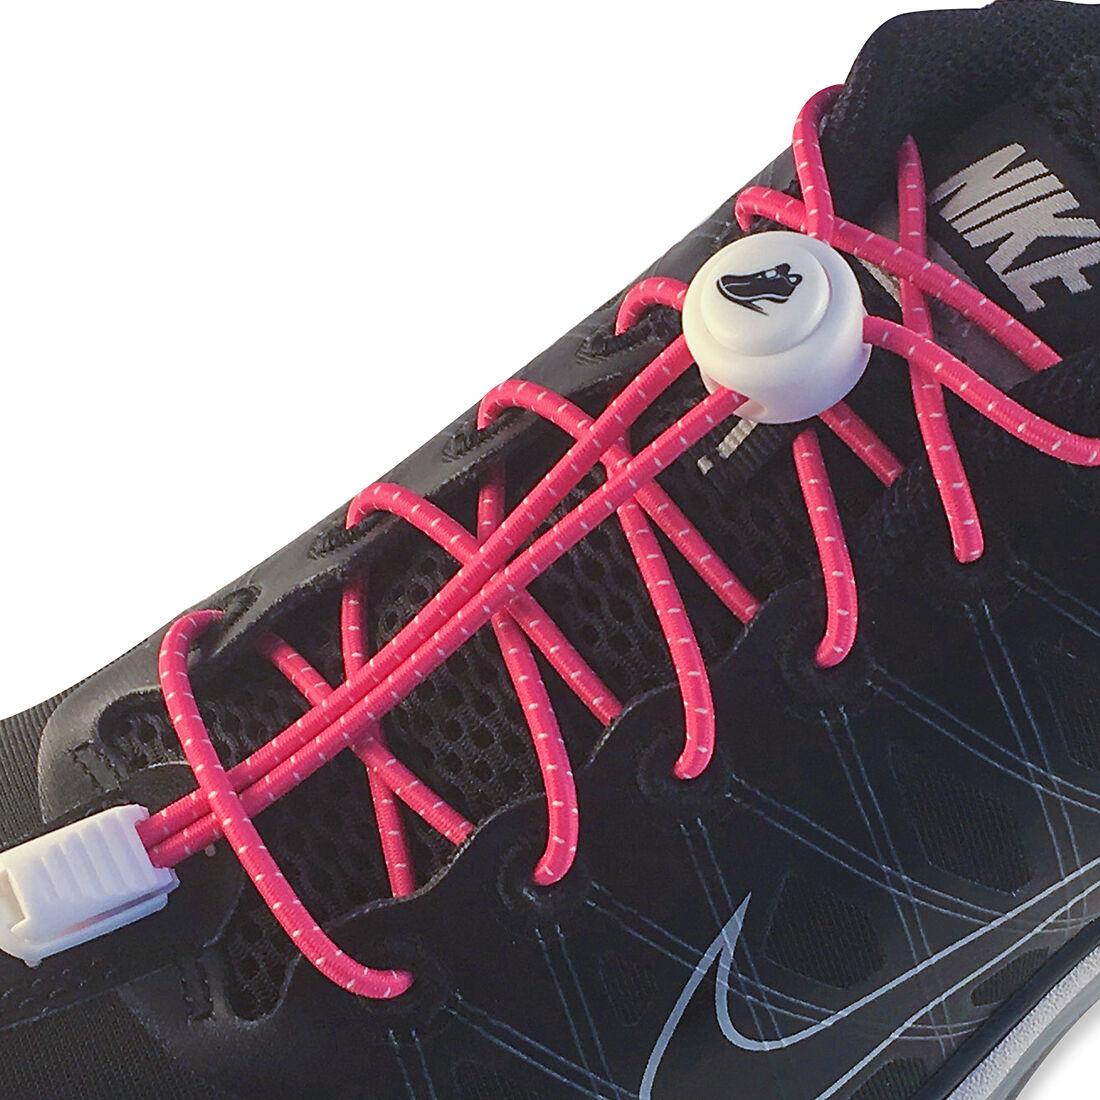 Elastic Unisex Shoe Lace No Tie Locking Sneaker Athletic Running Shoelaces